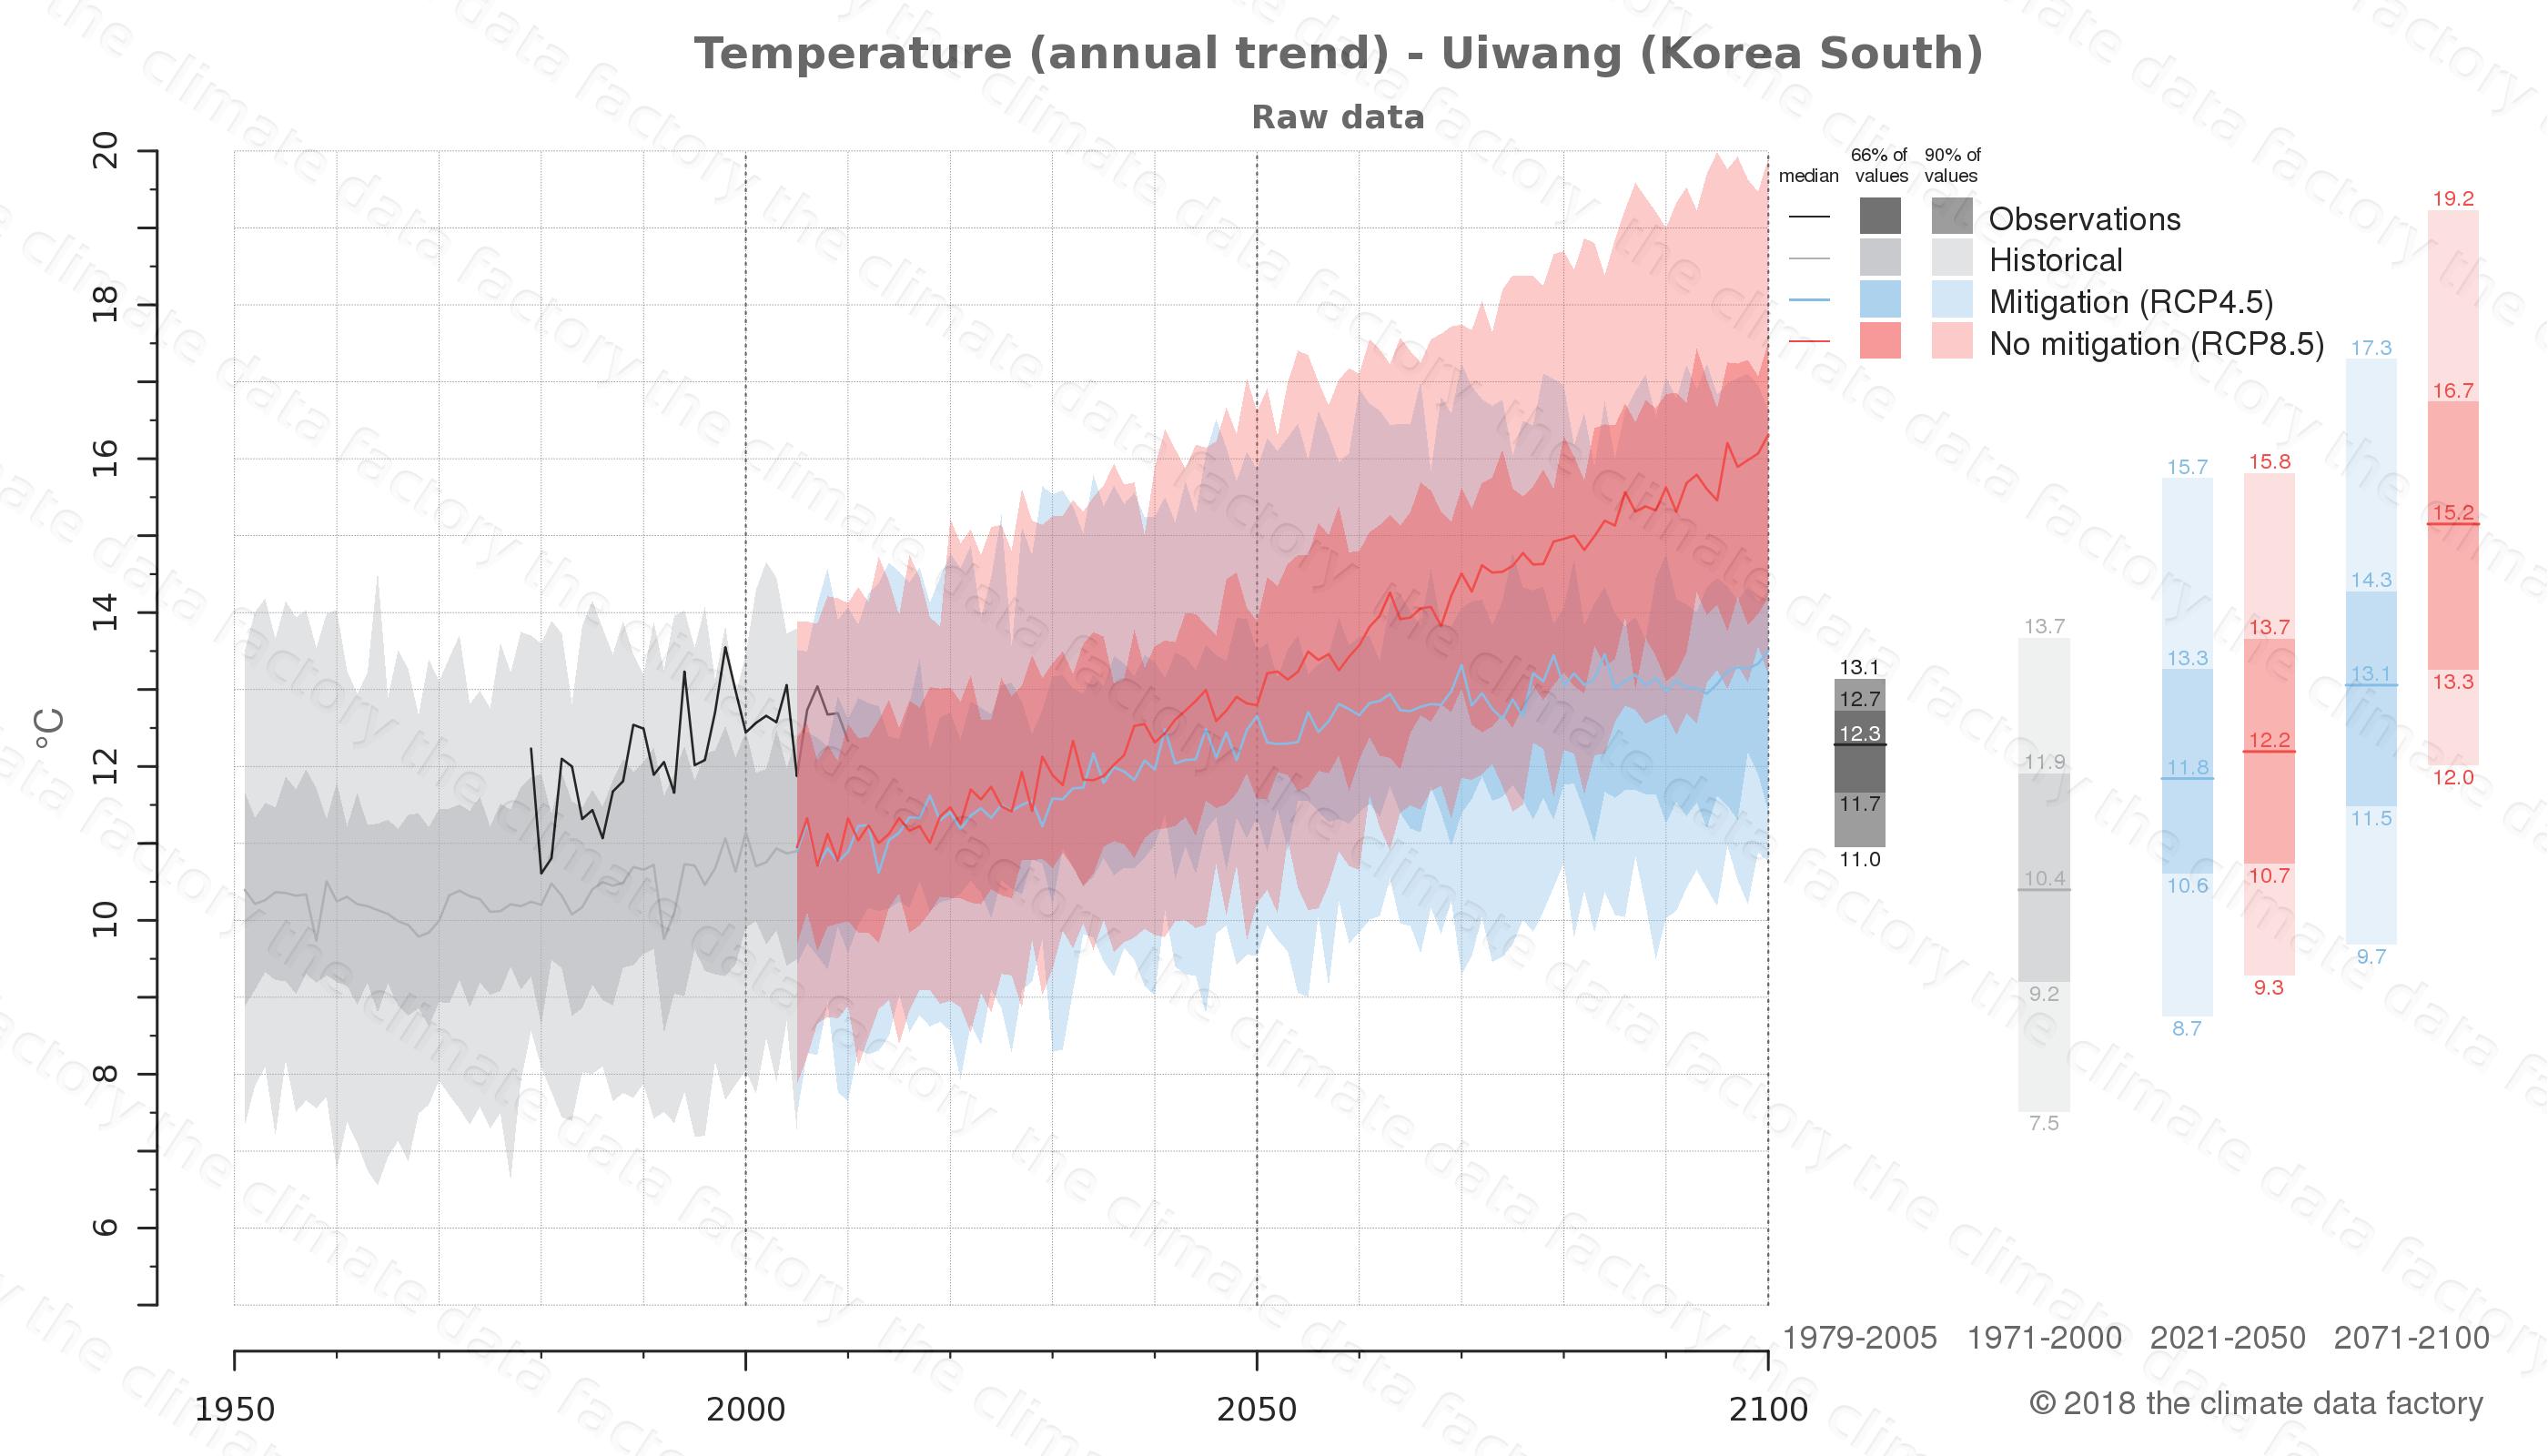 climate change data policy adaptation climate graph city data temperature uiwang south korea